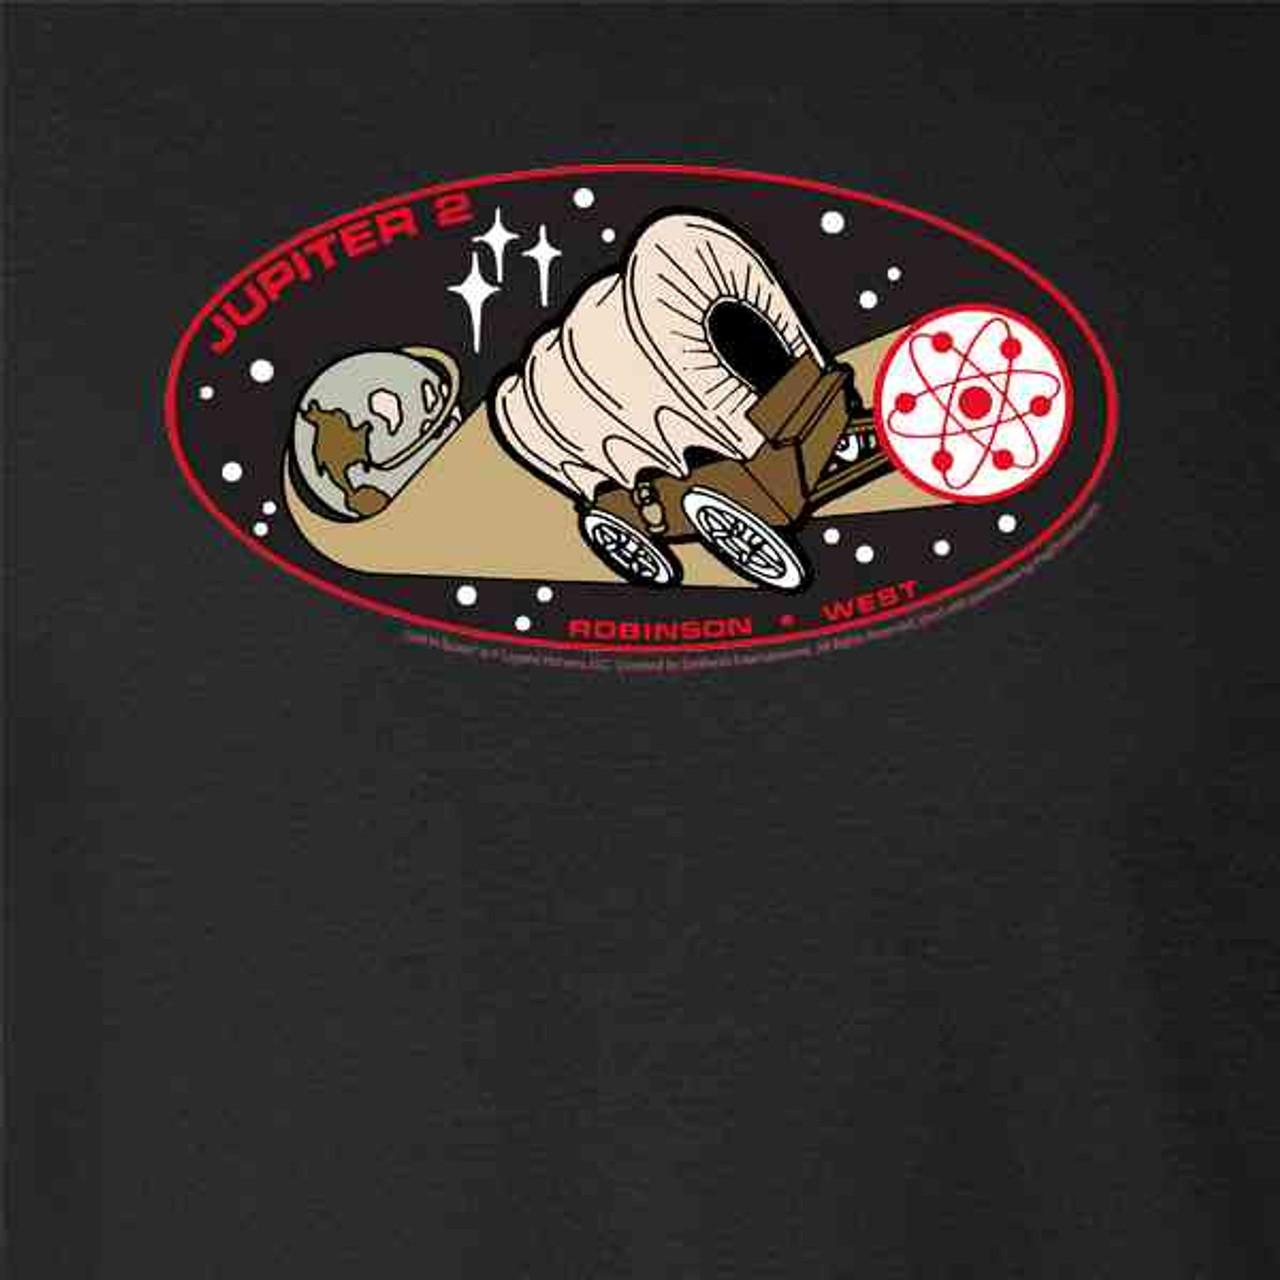 Lost in Space Jupiter 2 Gray 3XL Raglan Baseball Tee Shirt